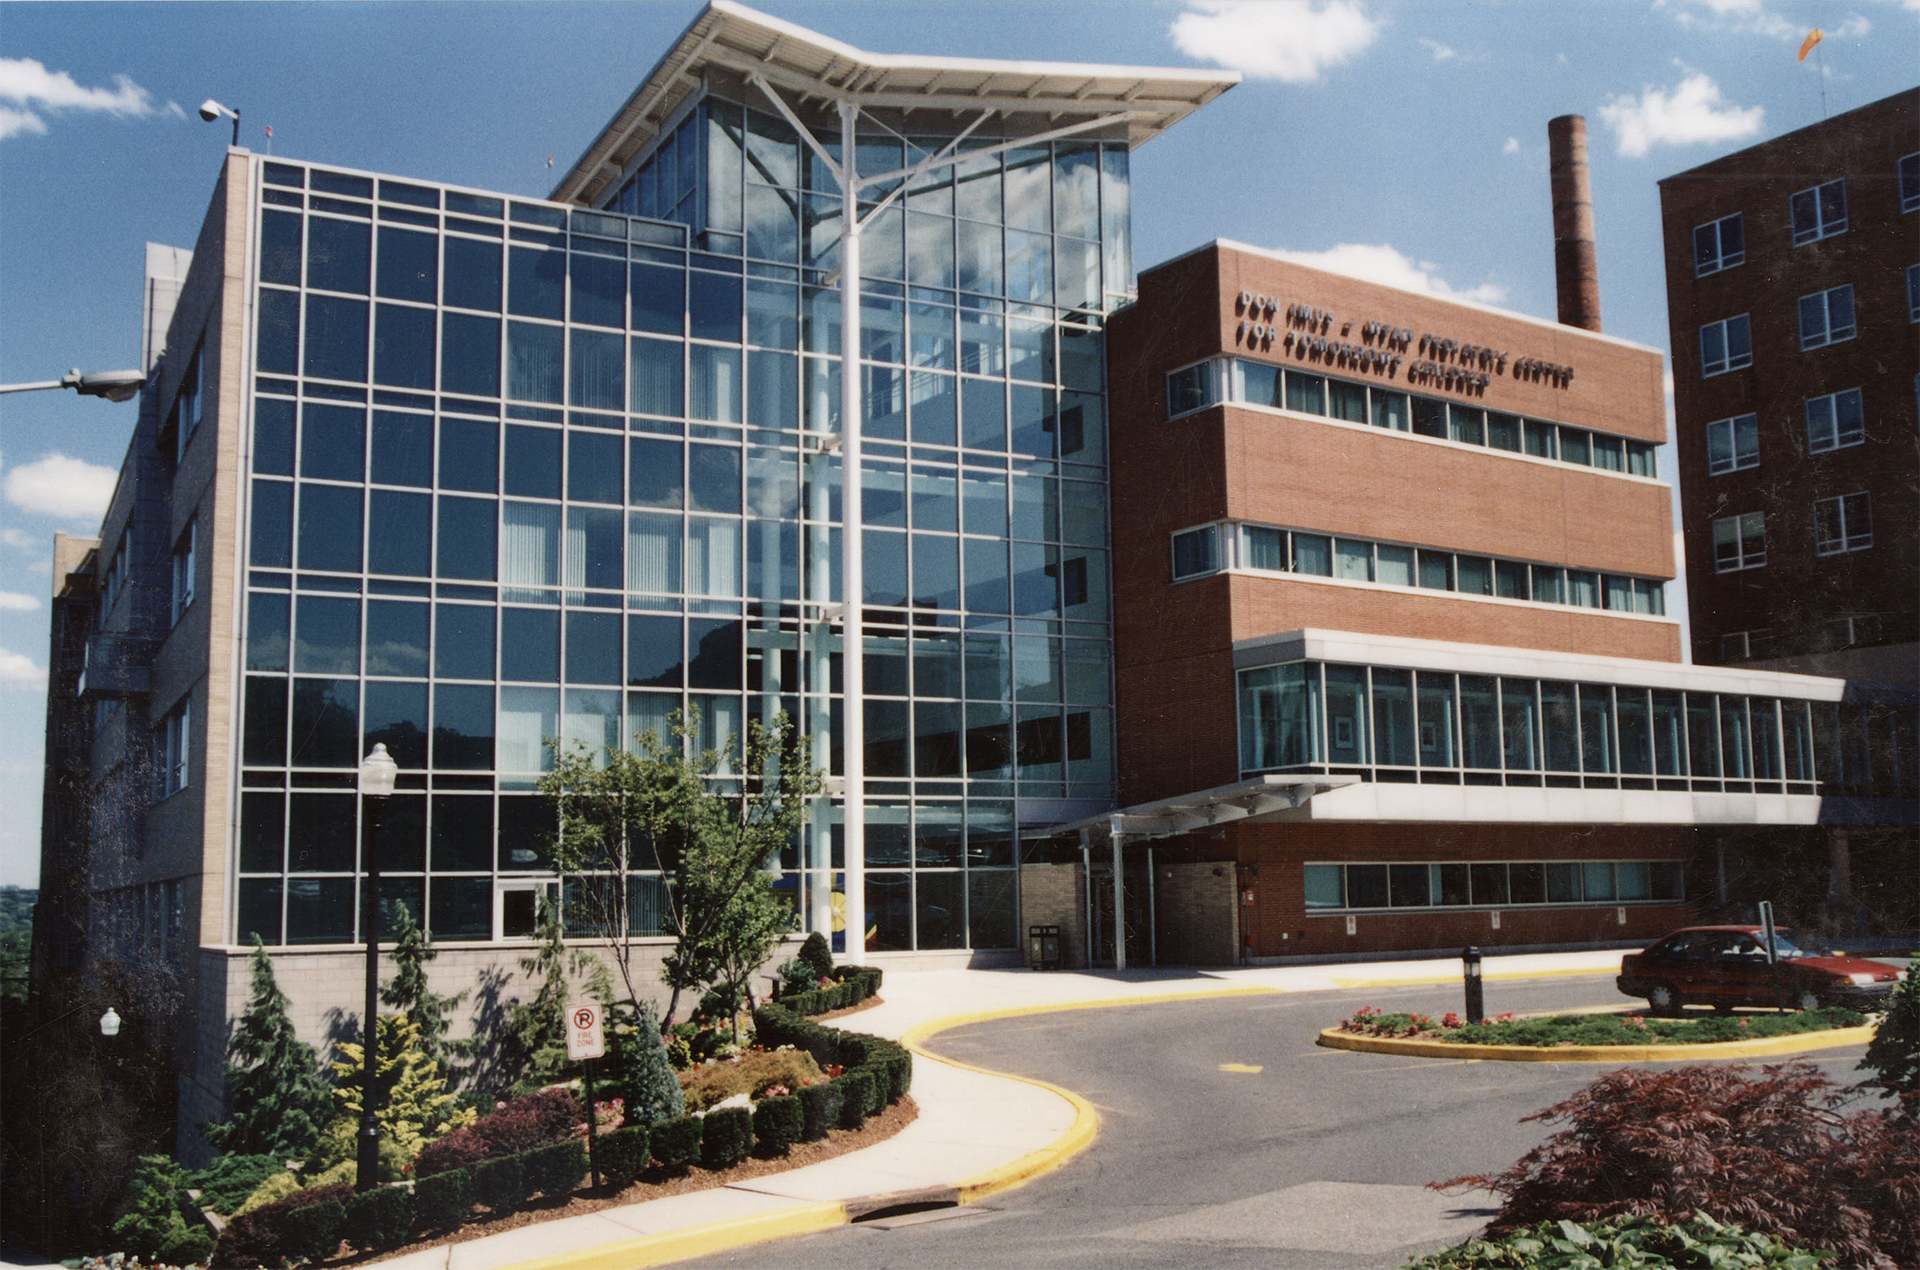 The Don Imus-WFAN Pediatric Center for Tomorrows Children